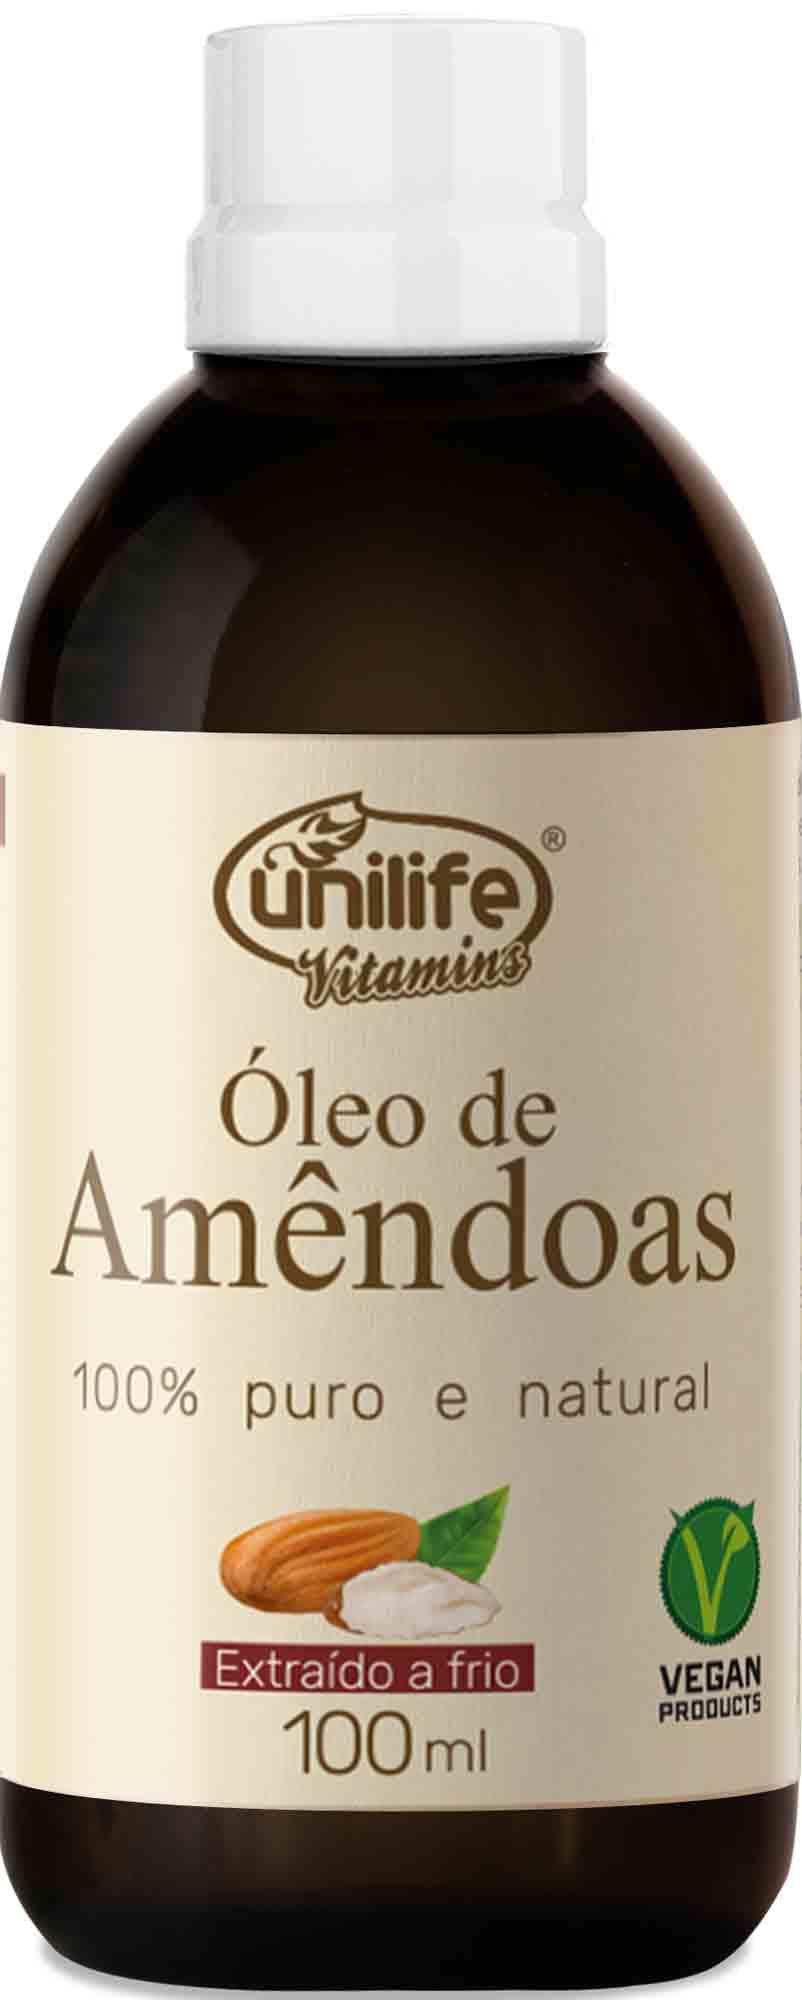 UNI OLEO DE AMENDOAS - 100ML Unilife